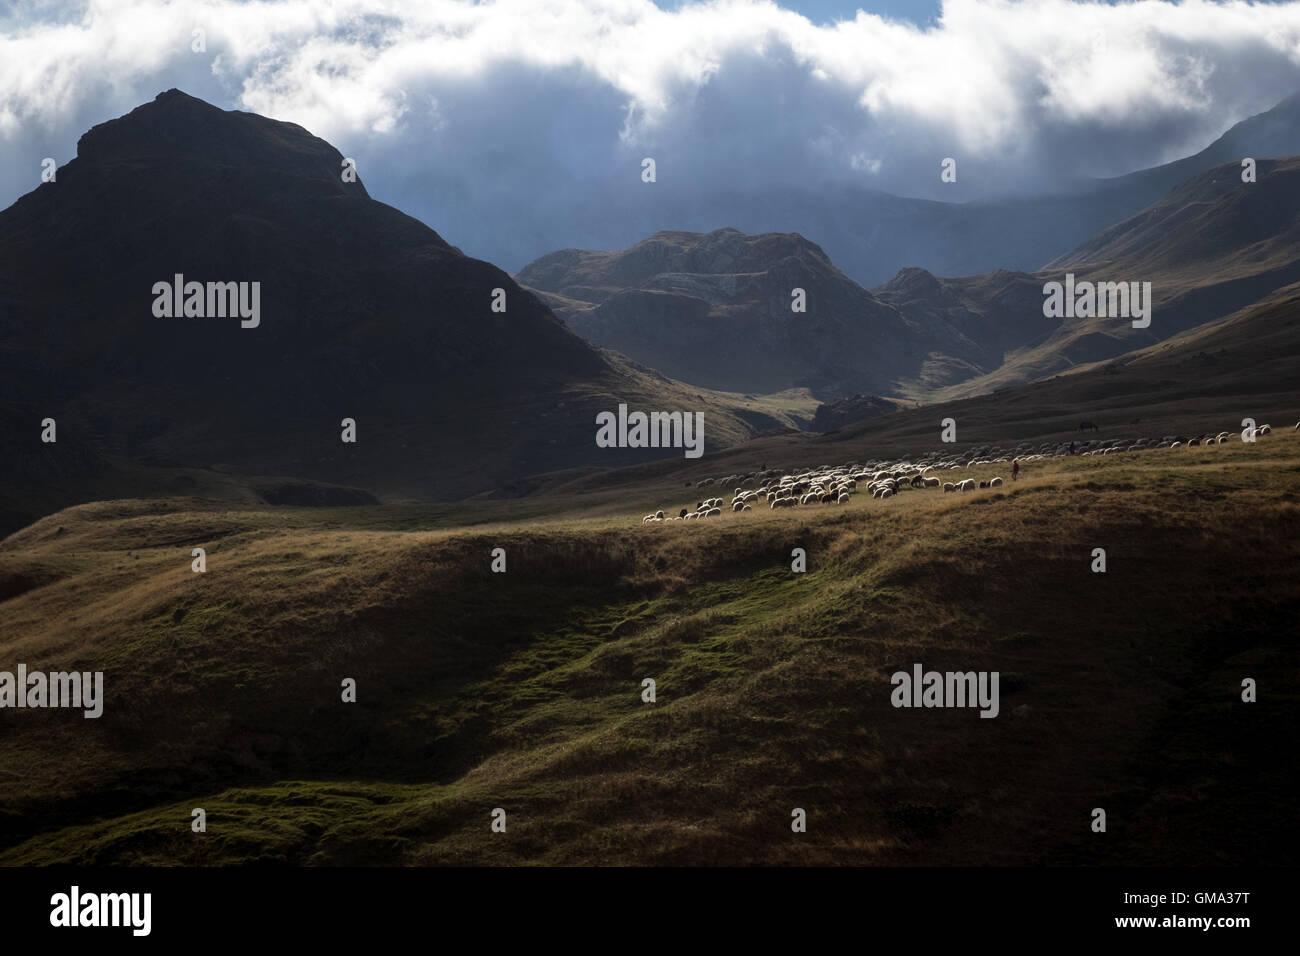 Flocks of sheep grazing along the Pyrenees border Portalet, France - Stock Image